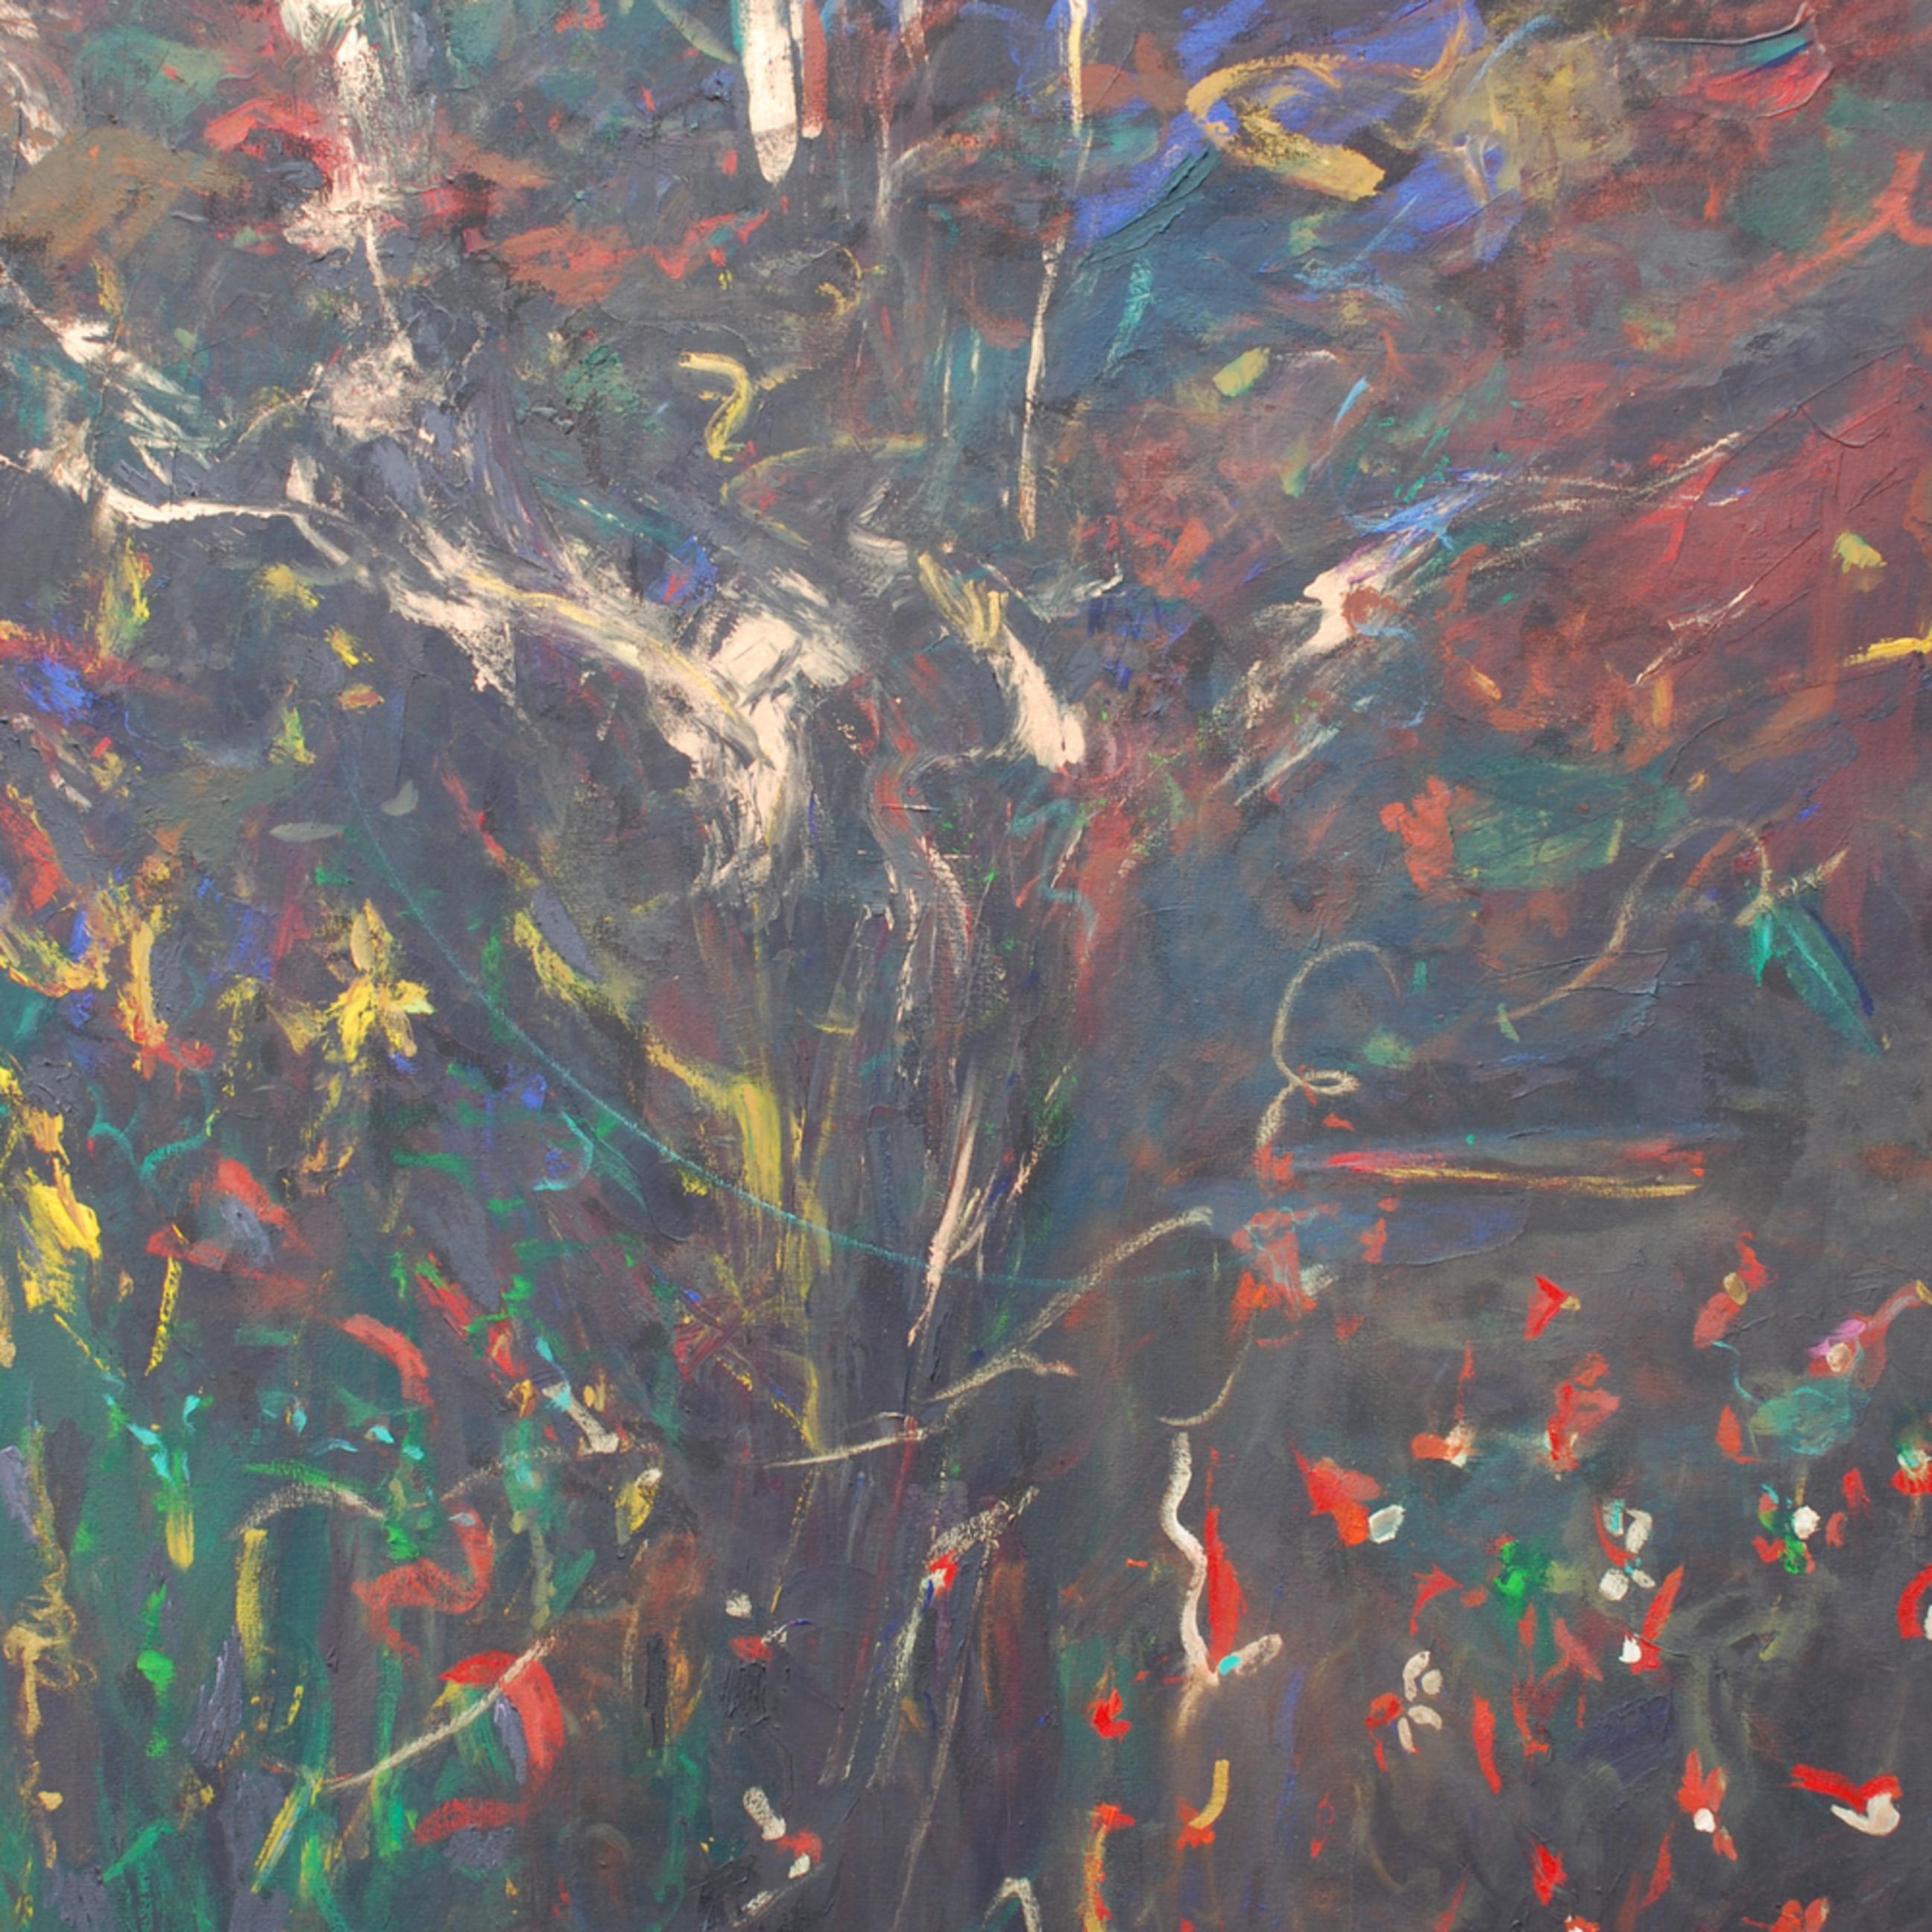 Mardi gras 48x72 acrylic on canvas vhwvm3